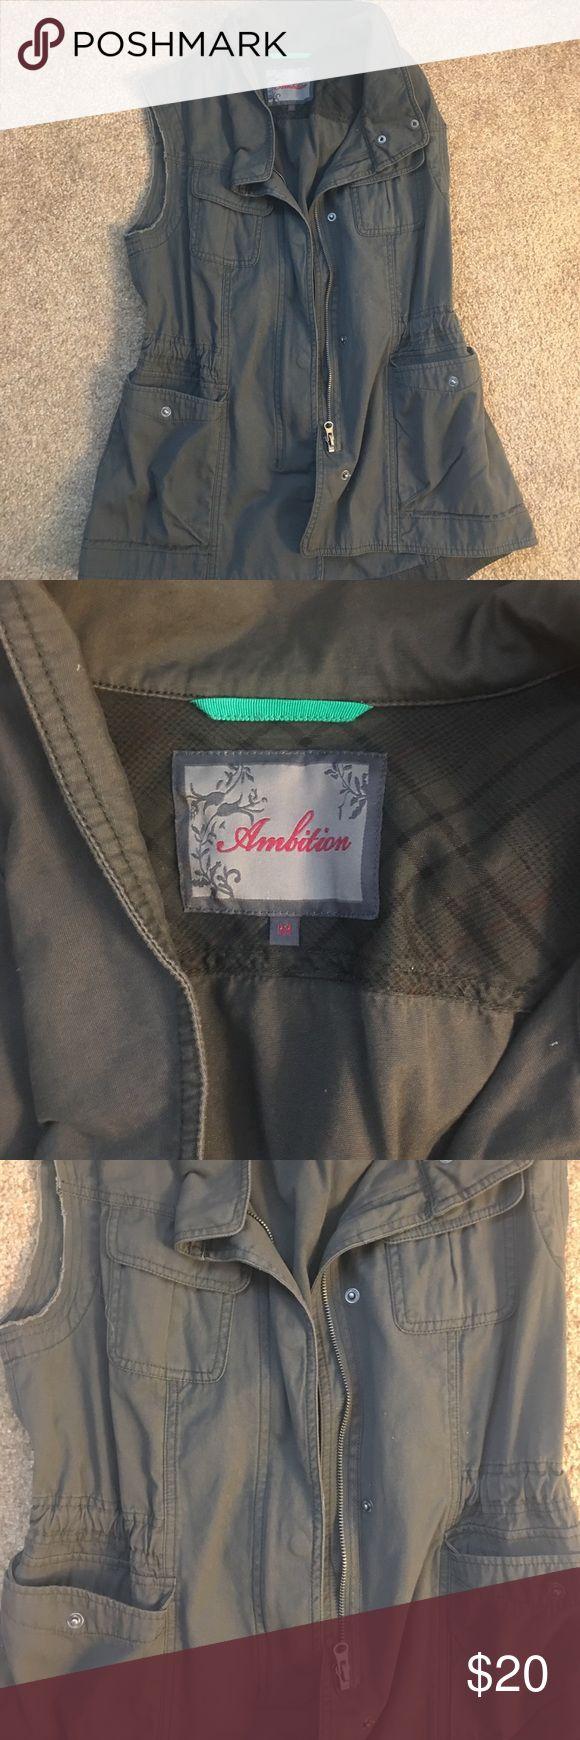 Olive green cargo vest Preppy green cargo vest with drawstring waist *never worn* got on Nordstrom's semi annual sale Nordstrom Jackets & Coats Vests